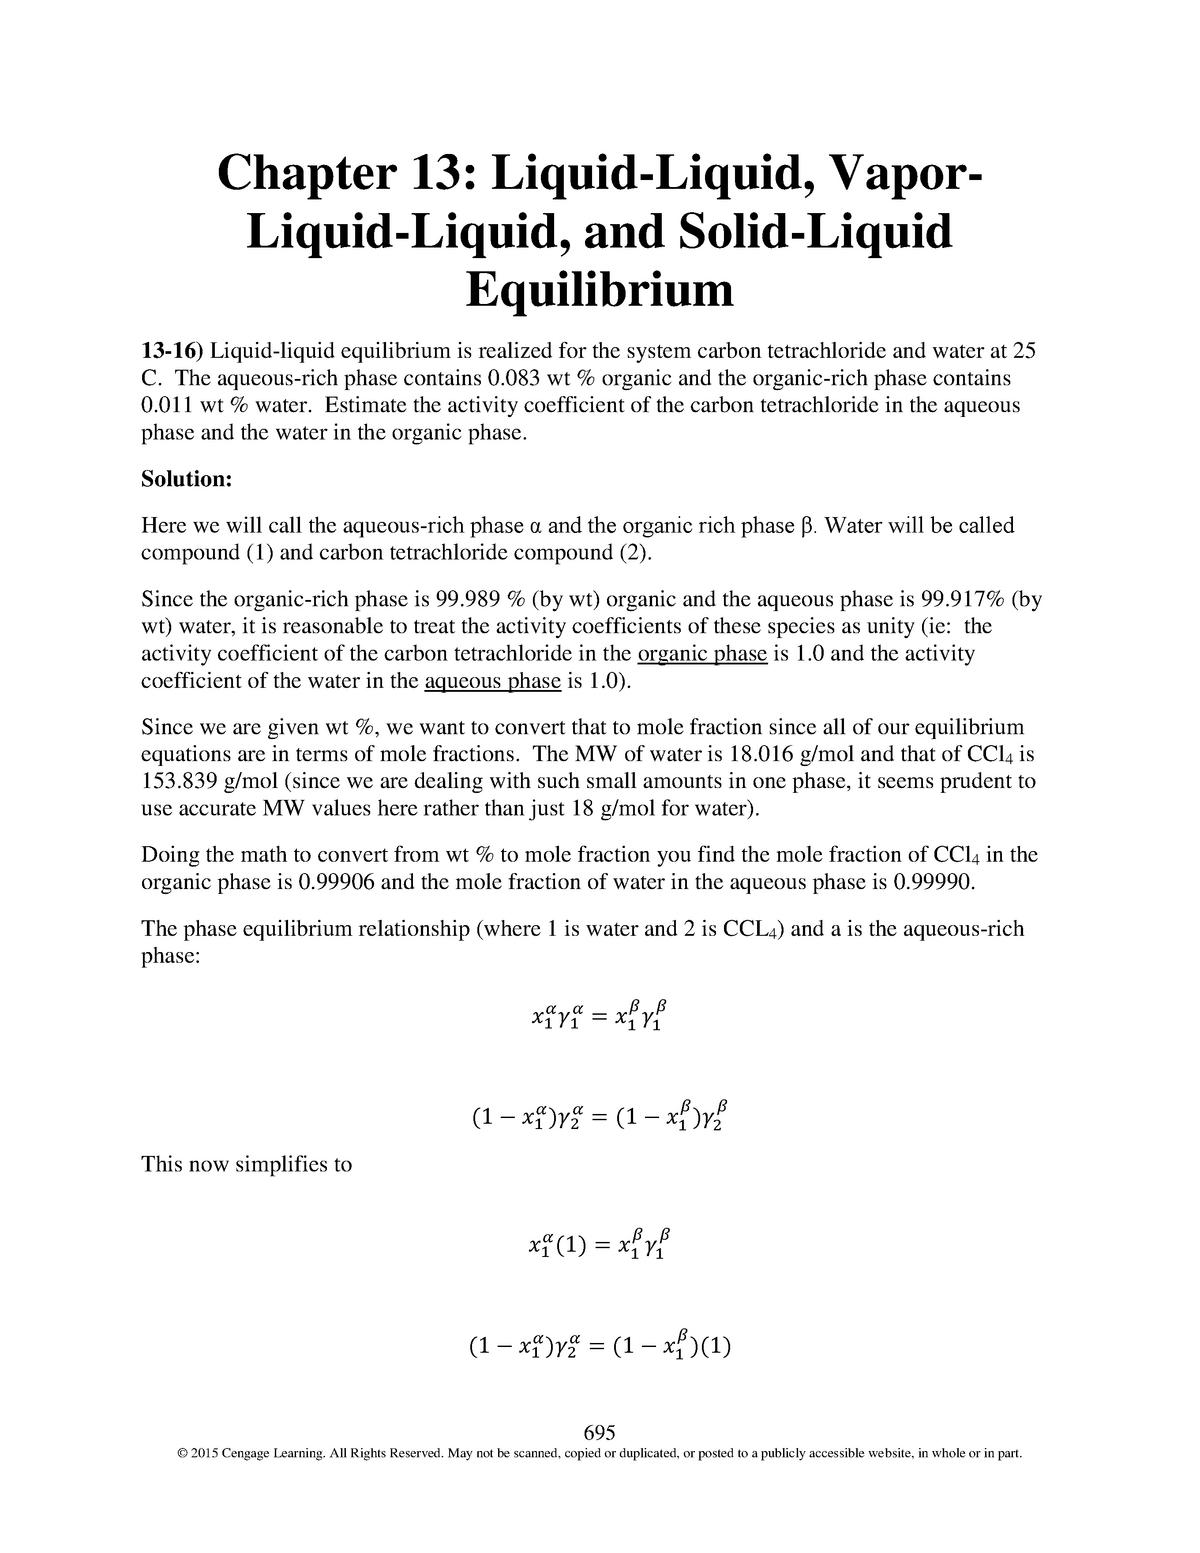 Dahm 1e Chapter 13 Fundamentals Of Chemical Engineering Thermodynamics Studocu [ 1553 x 1200 Pixel ]